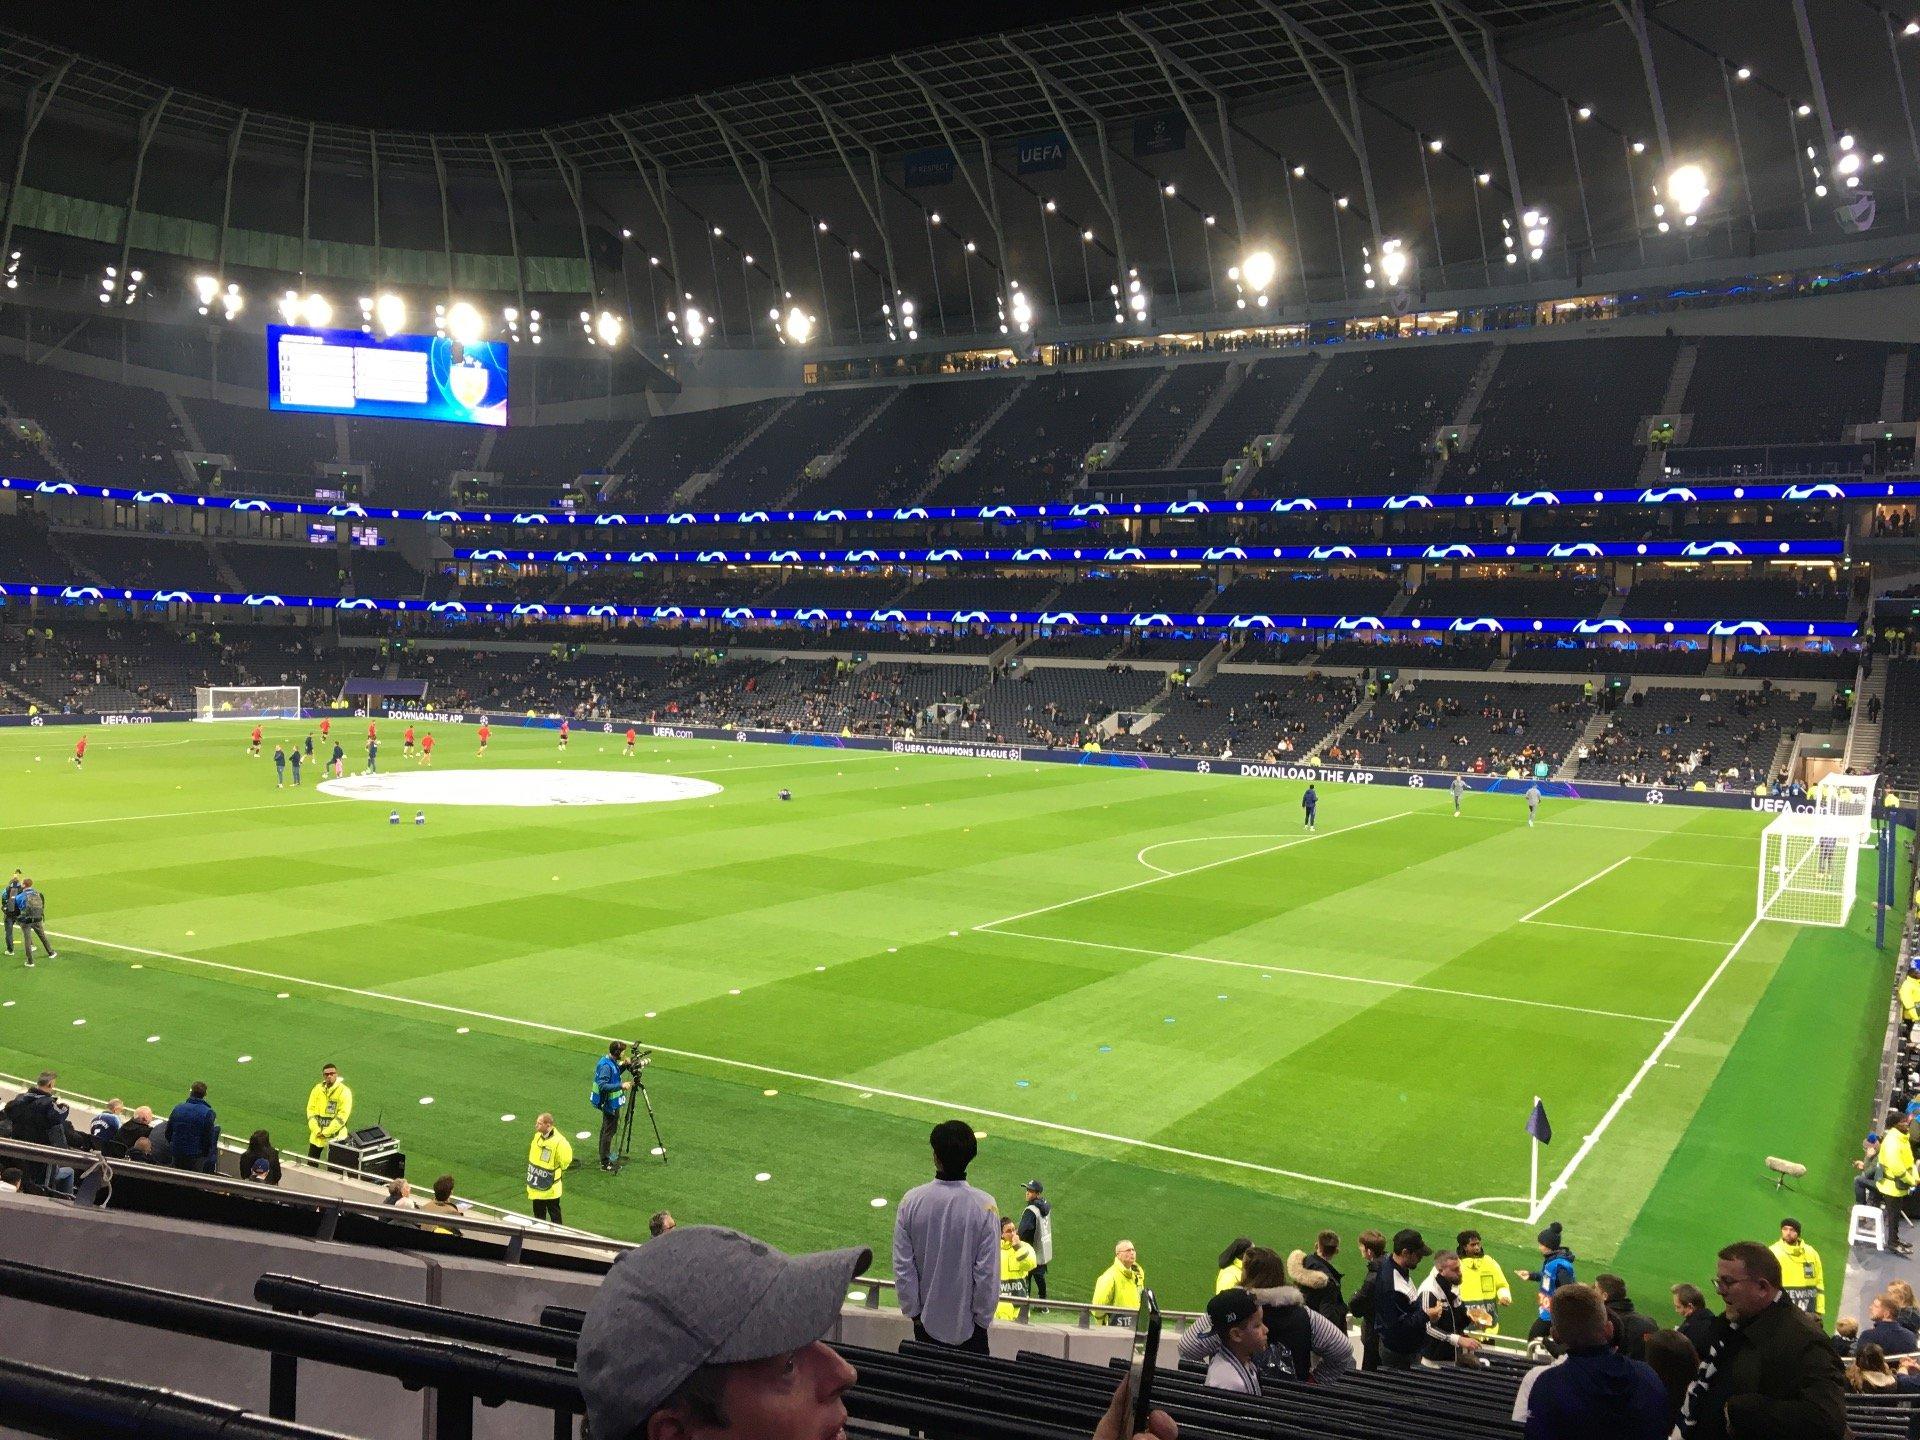 Tottenham Hotspur Stadium Section 260 Row 22 Seat 413